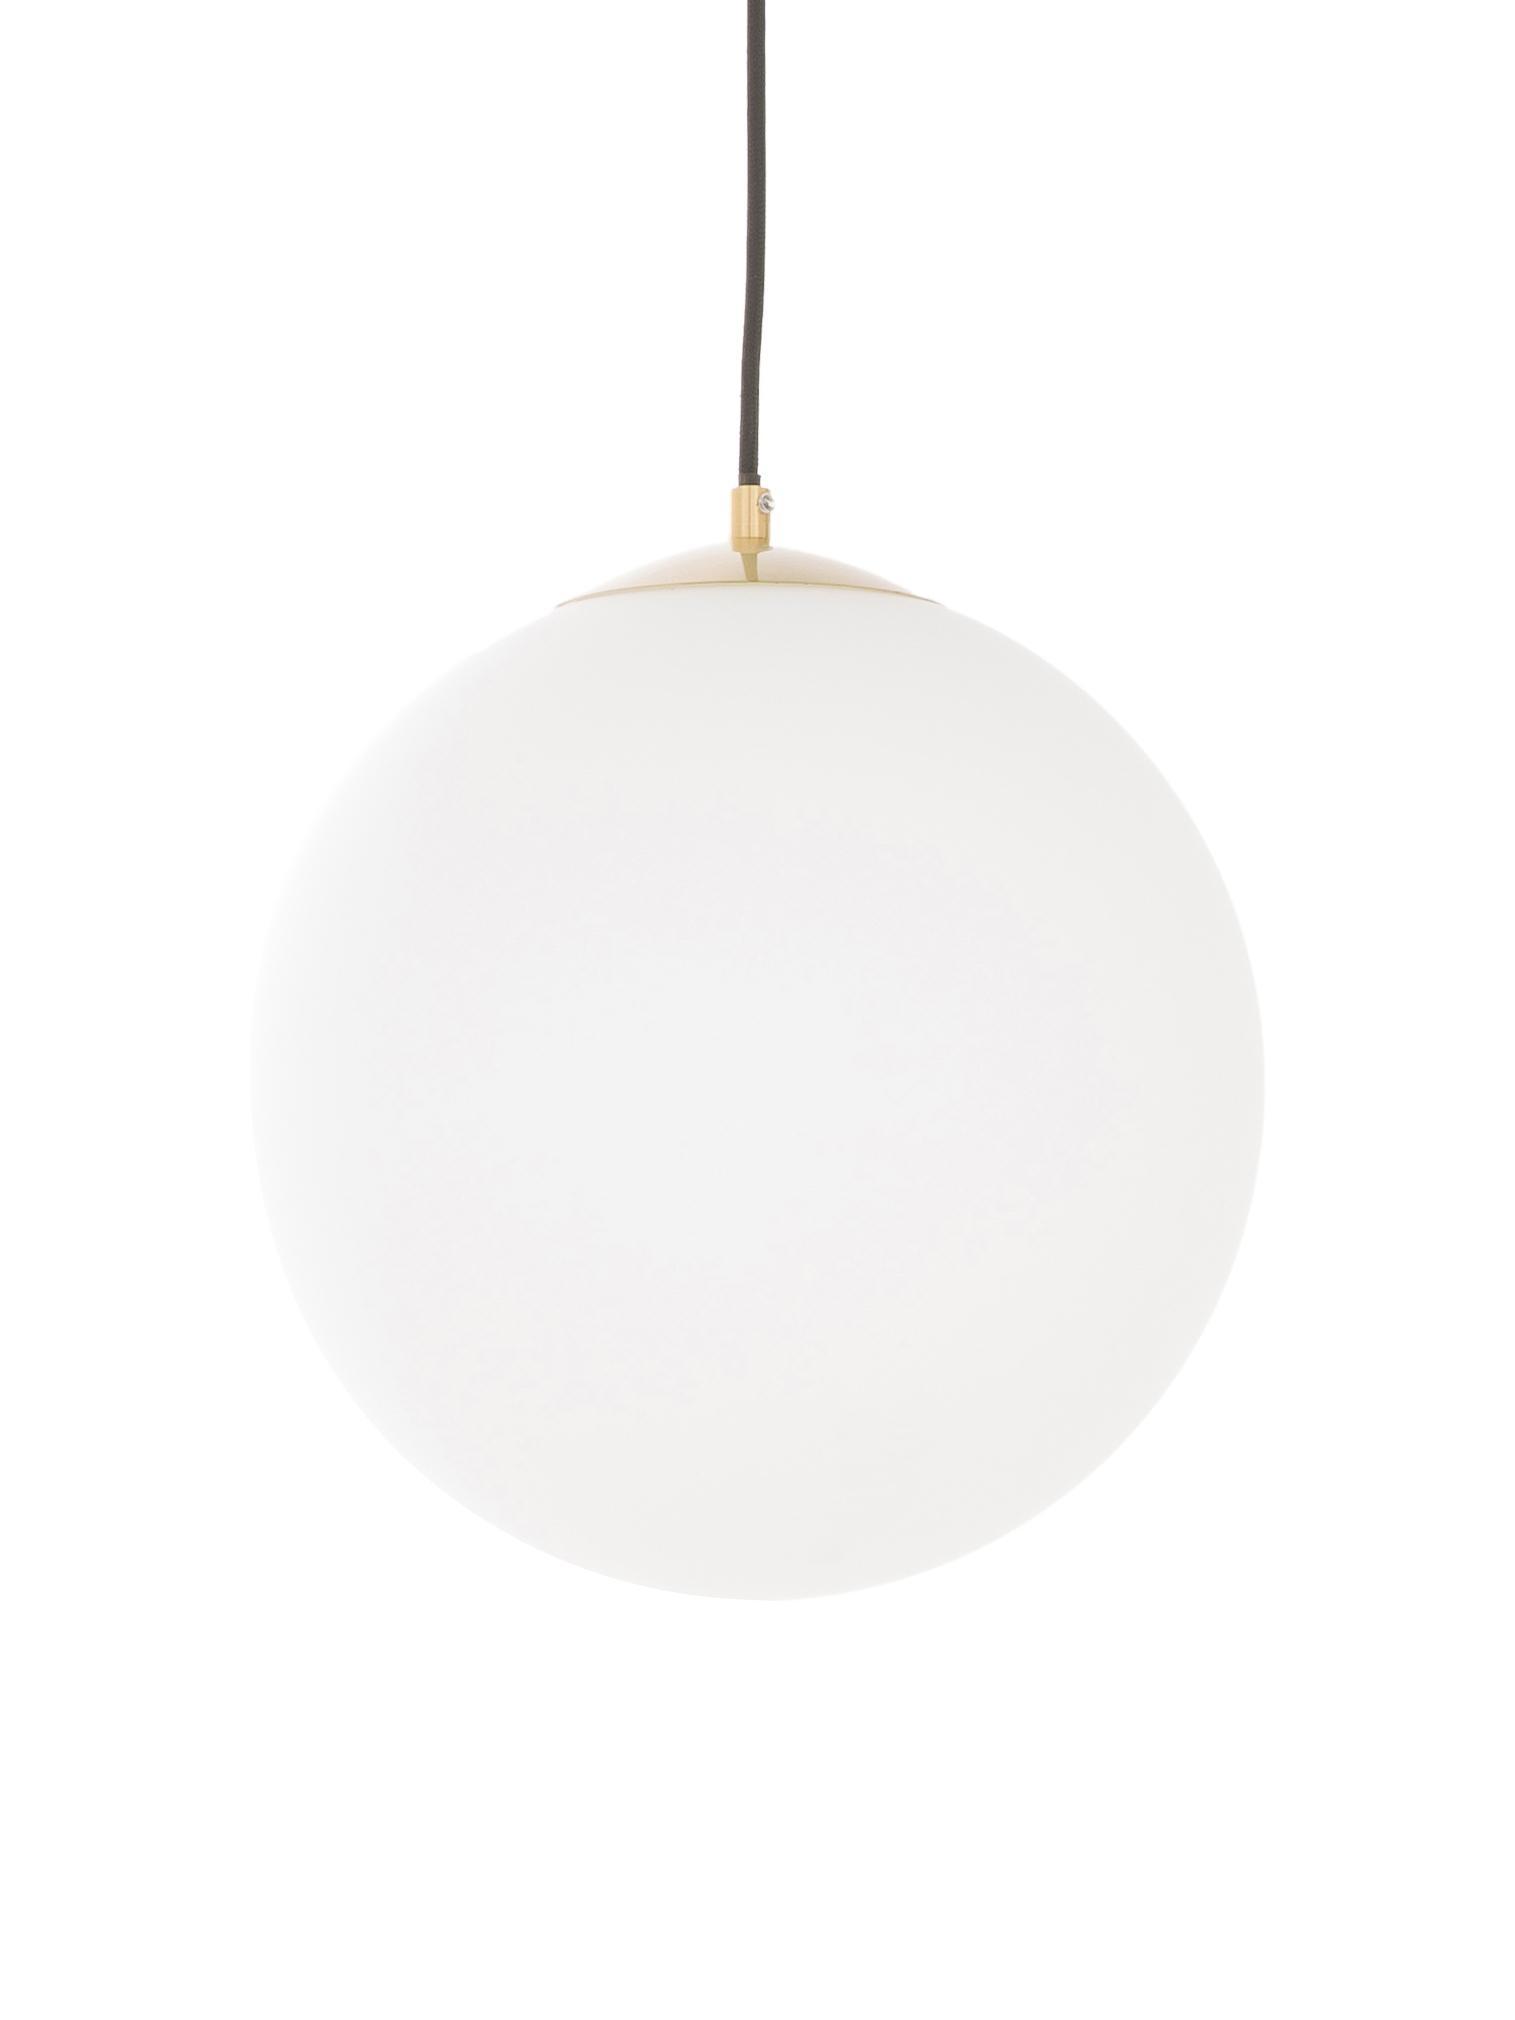 Lámpara de techo Beth, Pantalla: vidrio, Cable: tela, Blanco, latón, Ø 30 cm